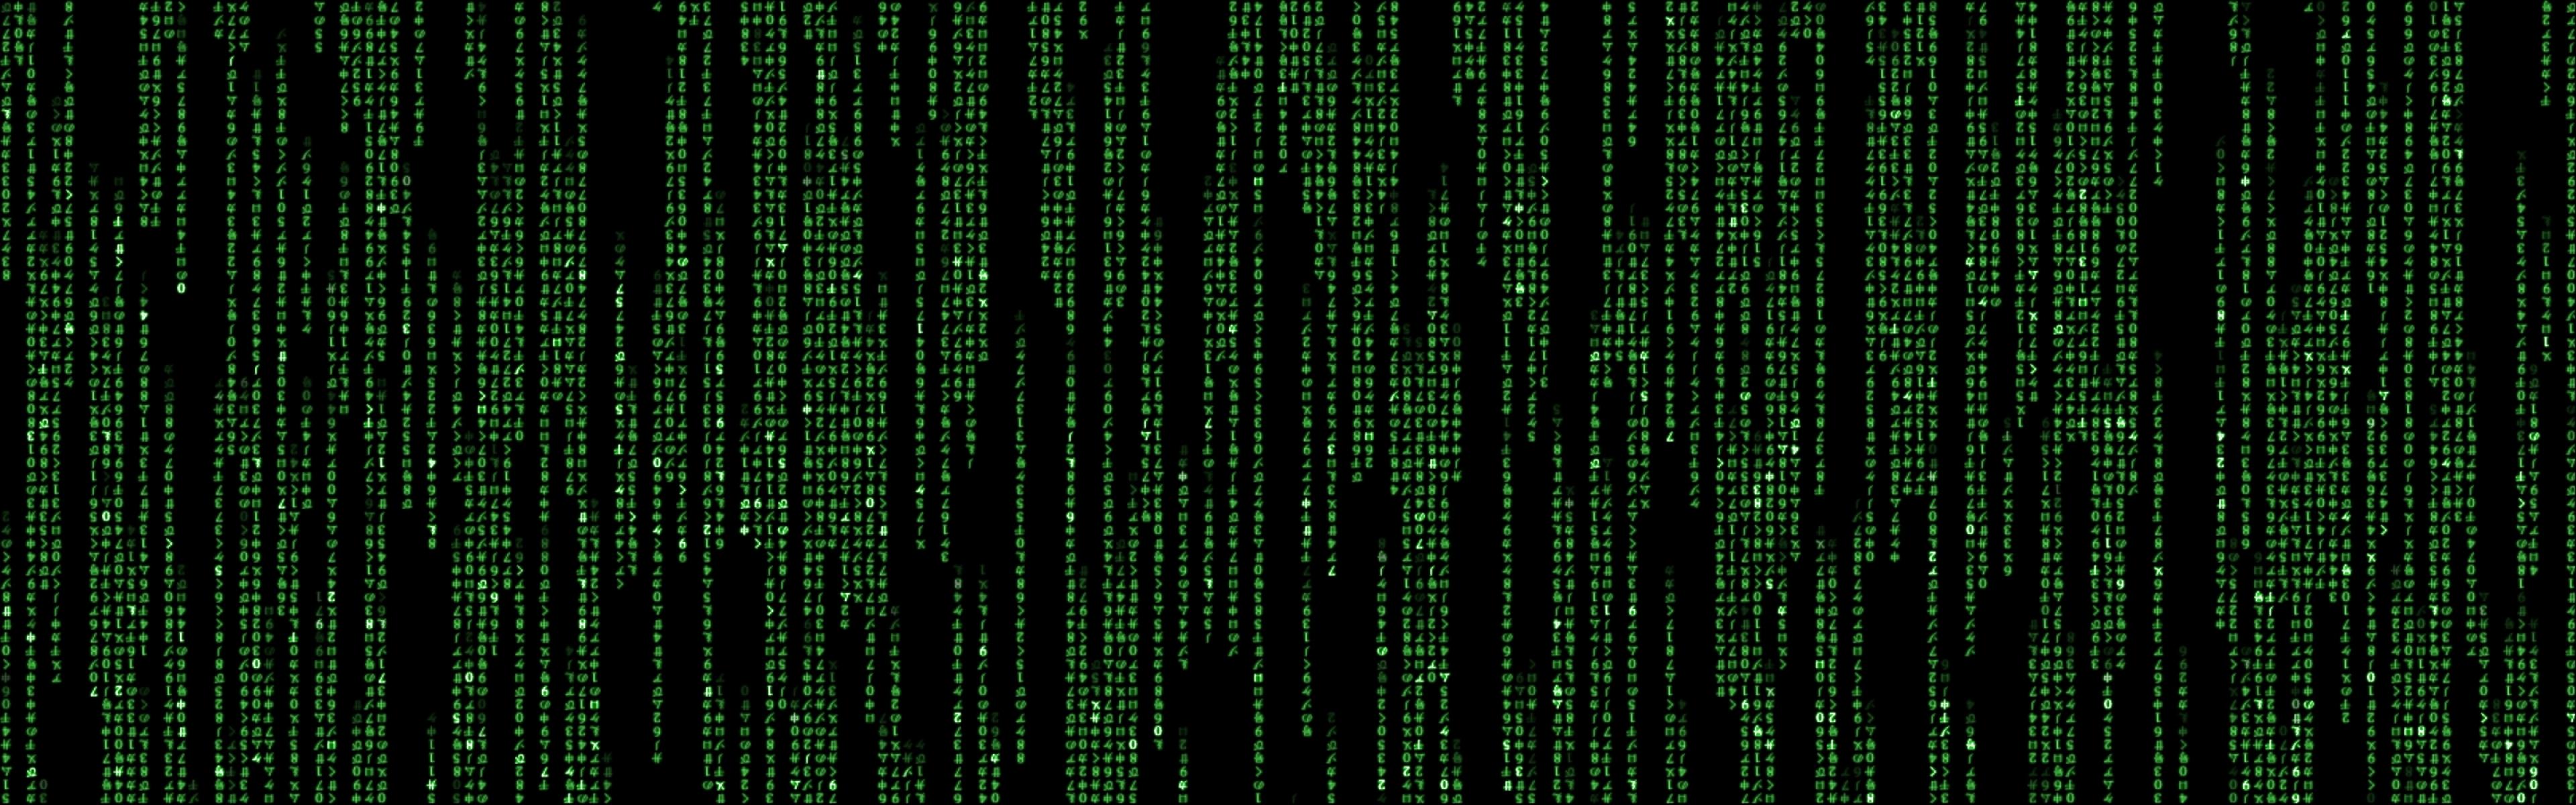 matrix code hollywood 2880x900 wallpaper Entertainment HD Wallpaper 3840x1200